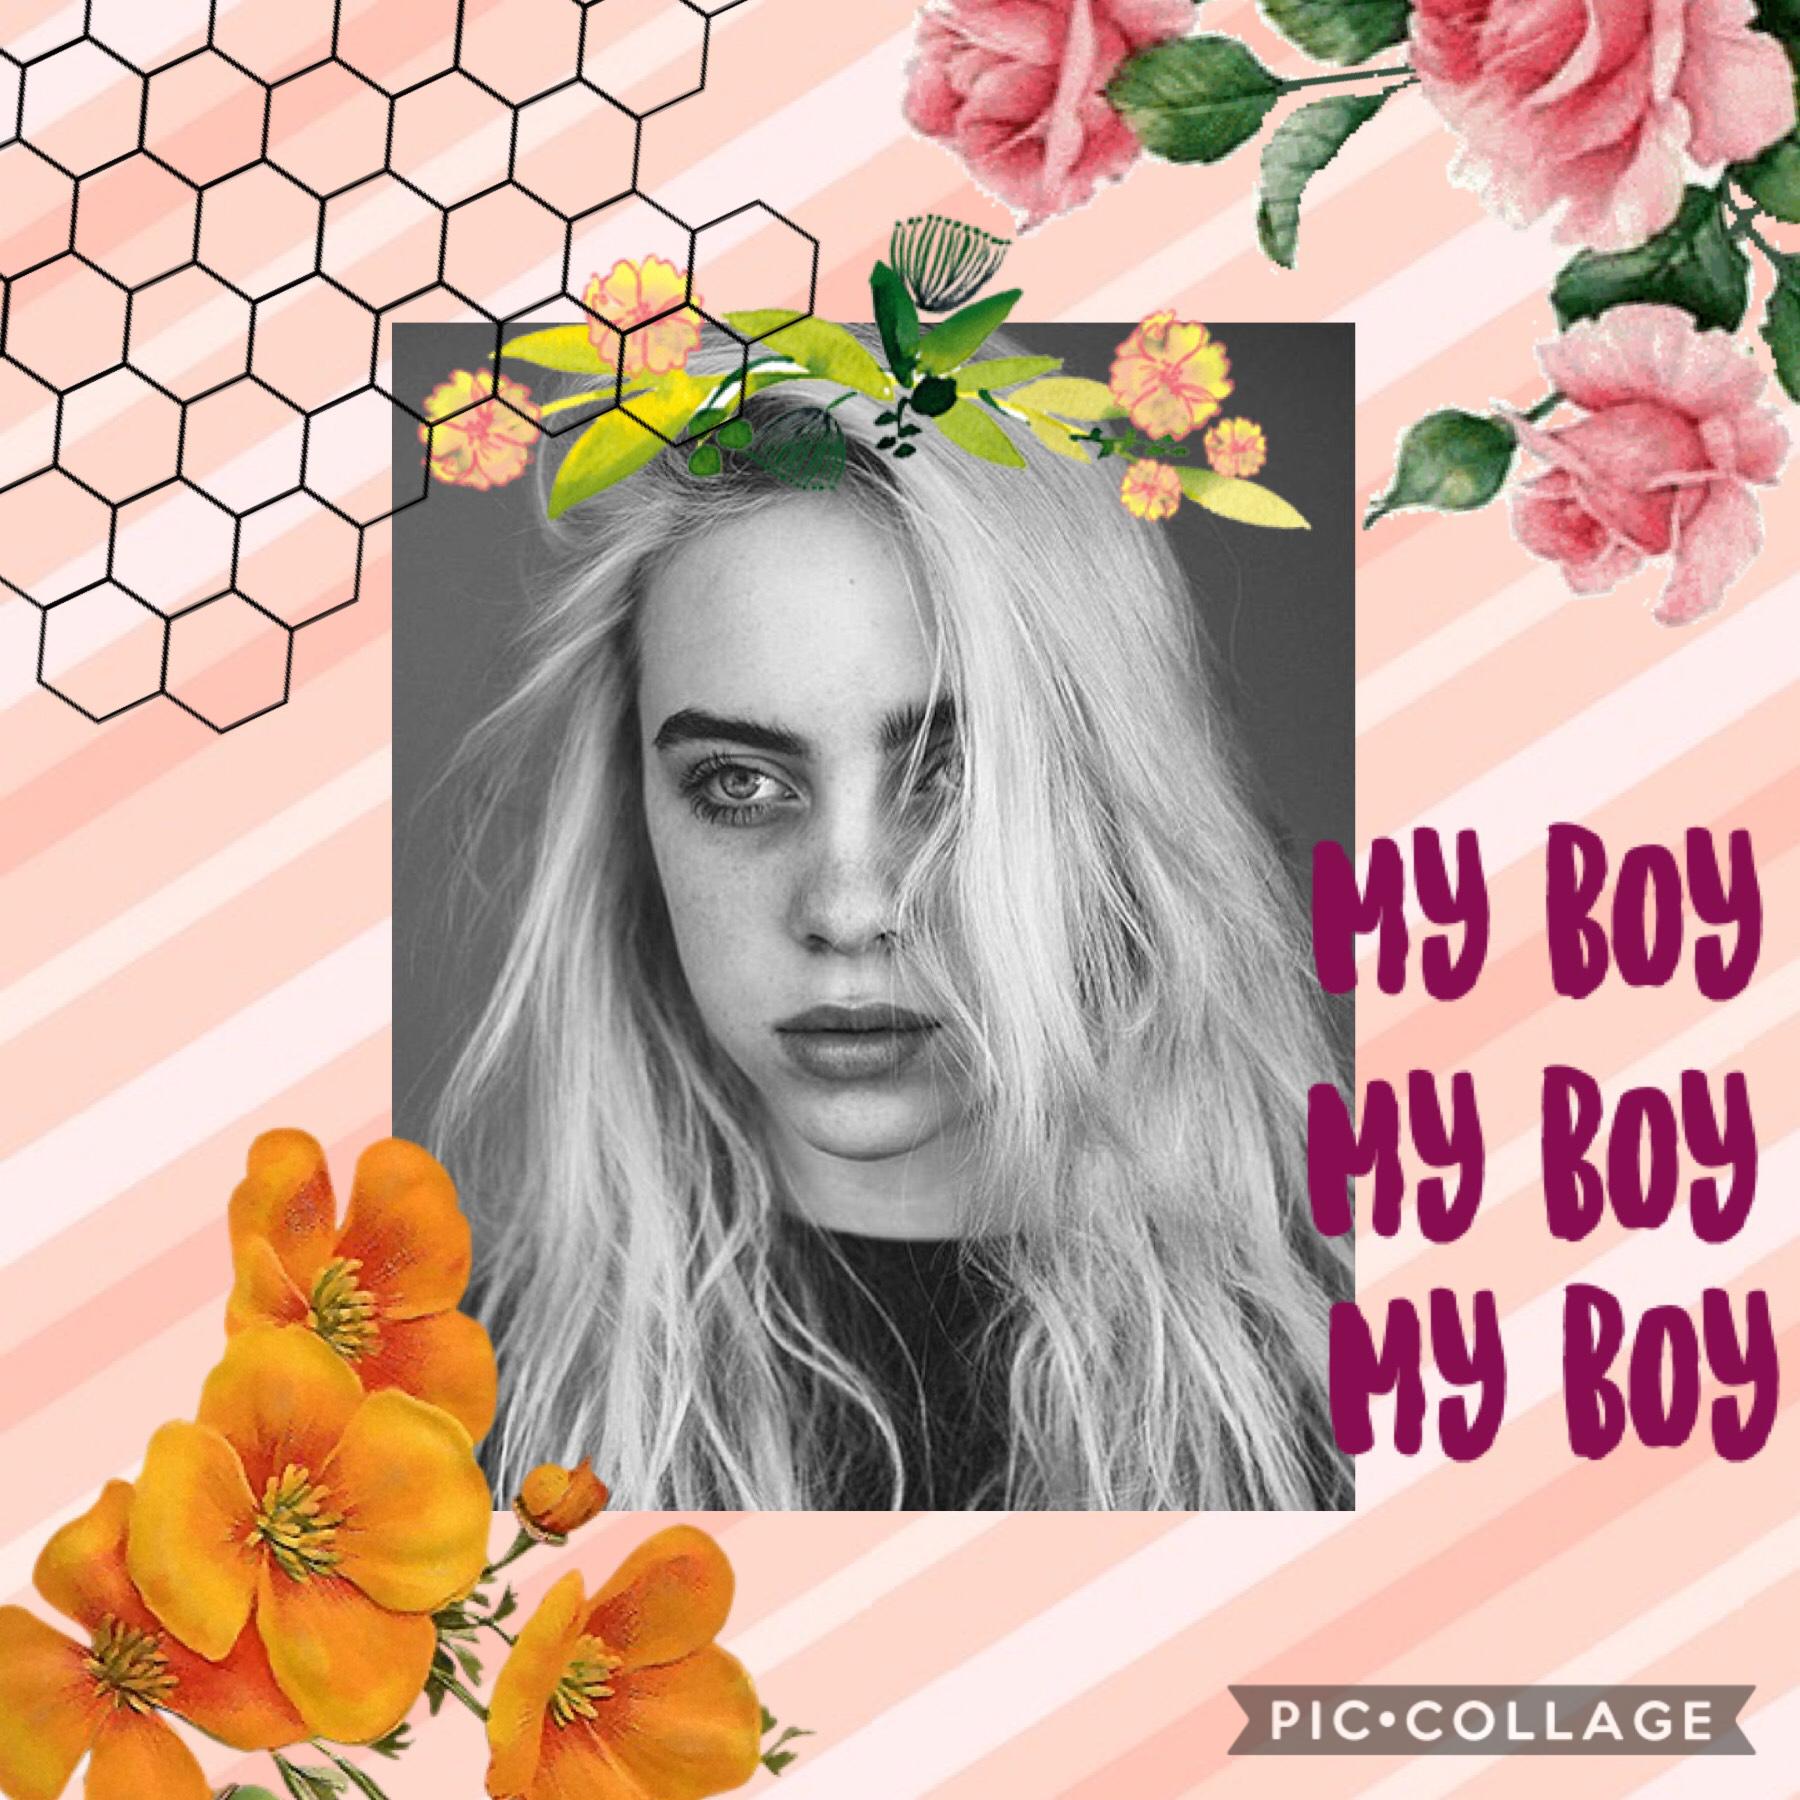 Collage by CherryEmma